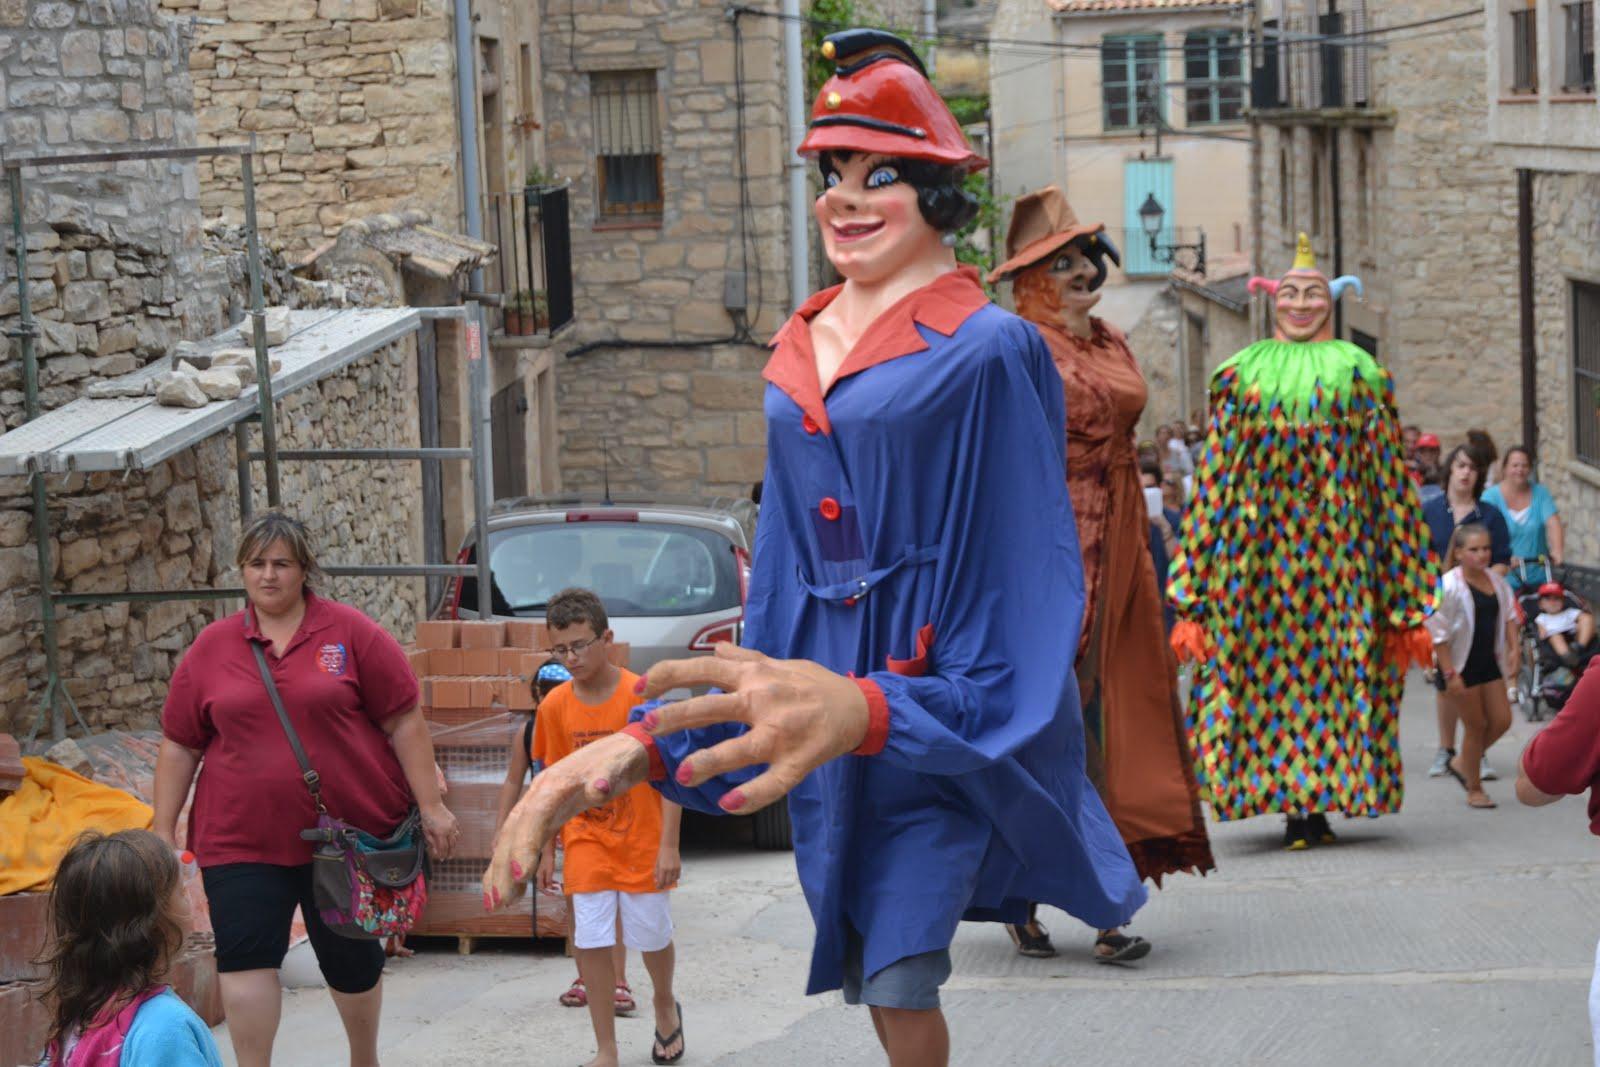 Festival Bla Bla a Vallfogona de Riucorb